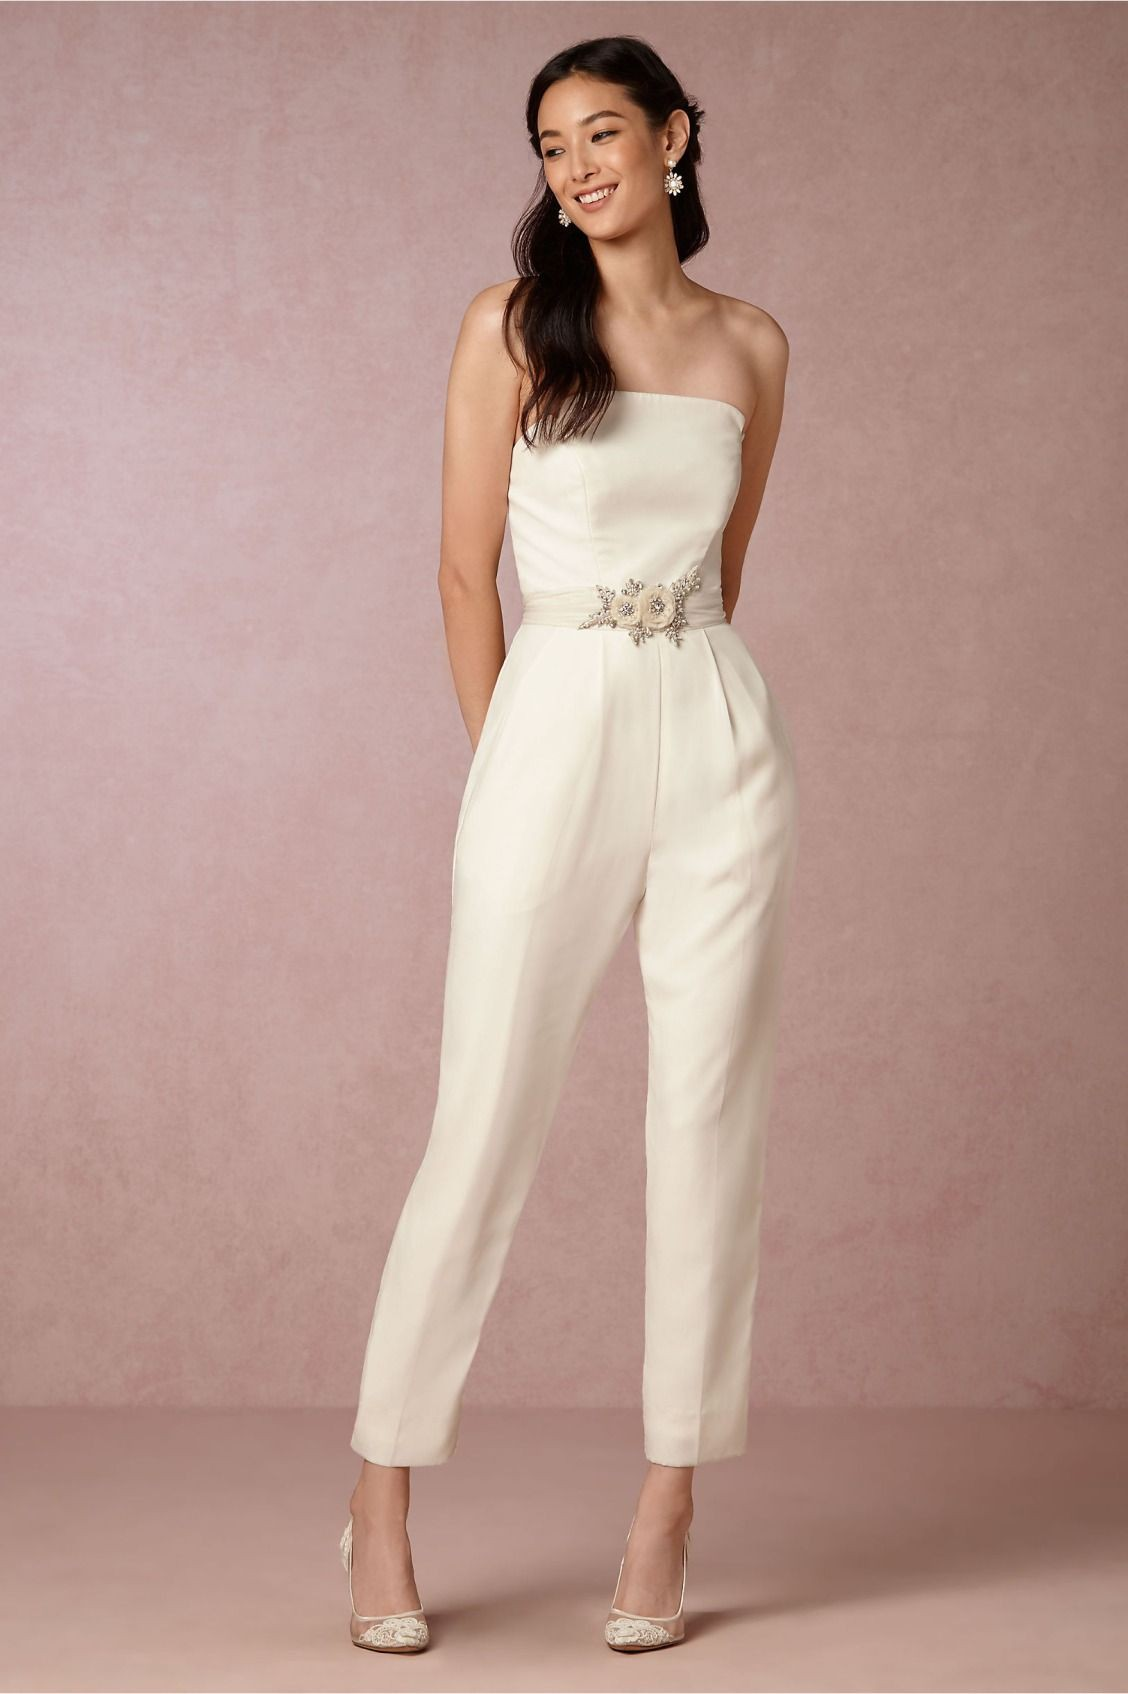 Party wear tips for bhldn white jumpsuit, Jill Jill Stuart